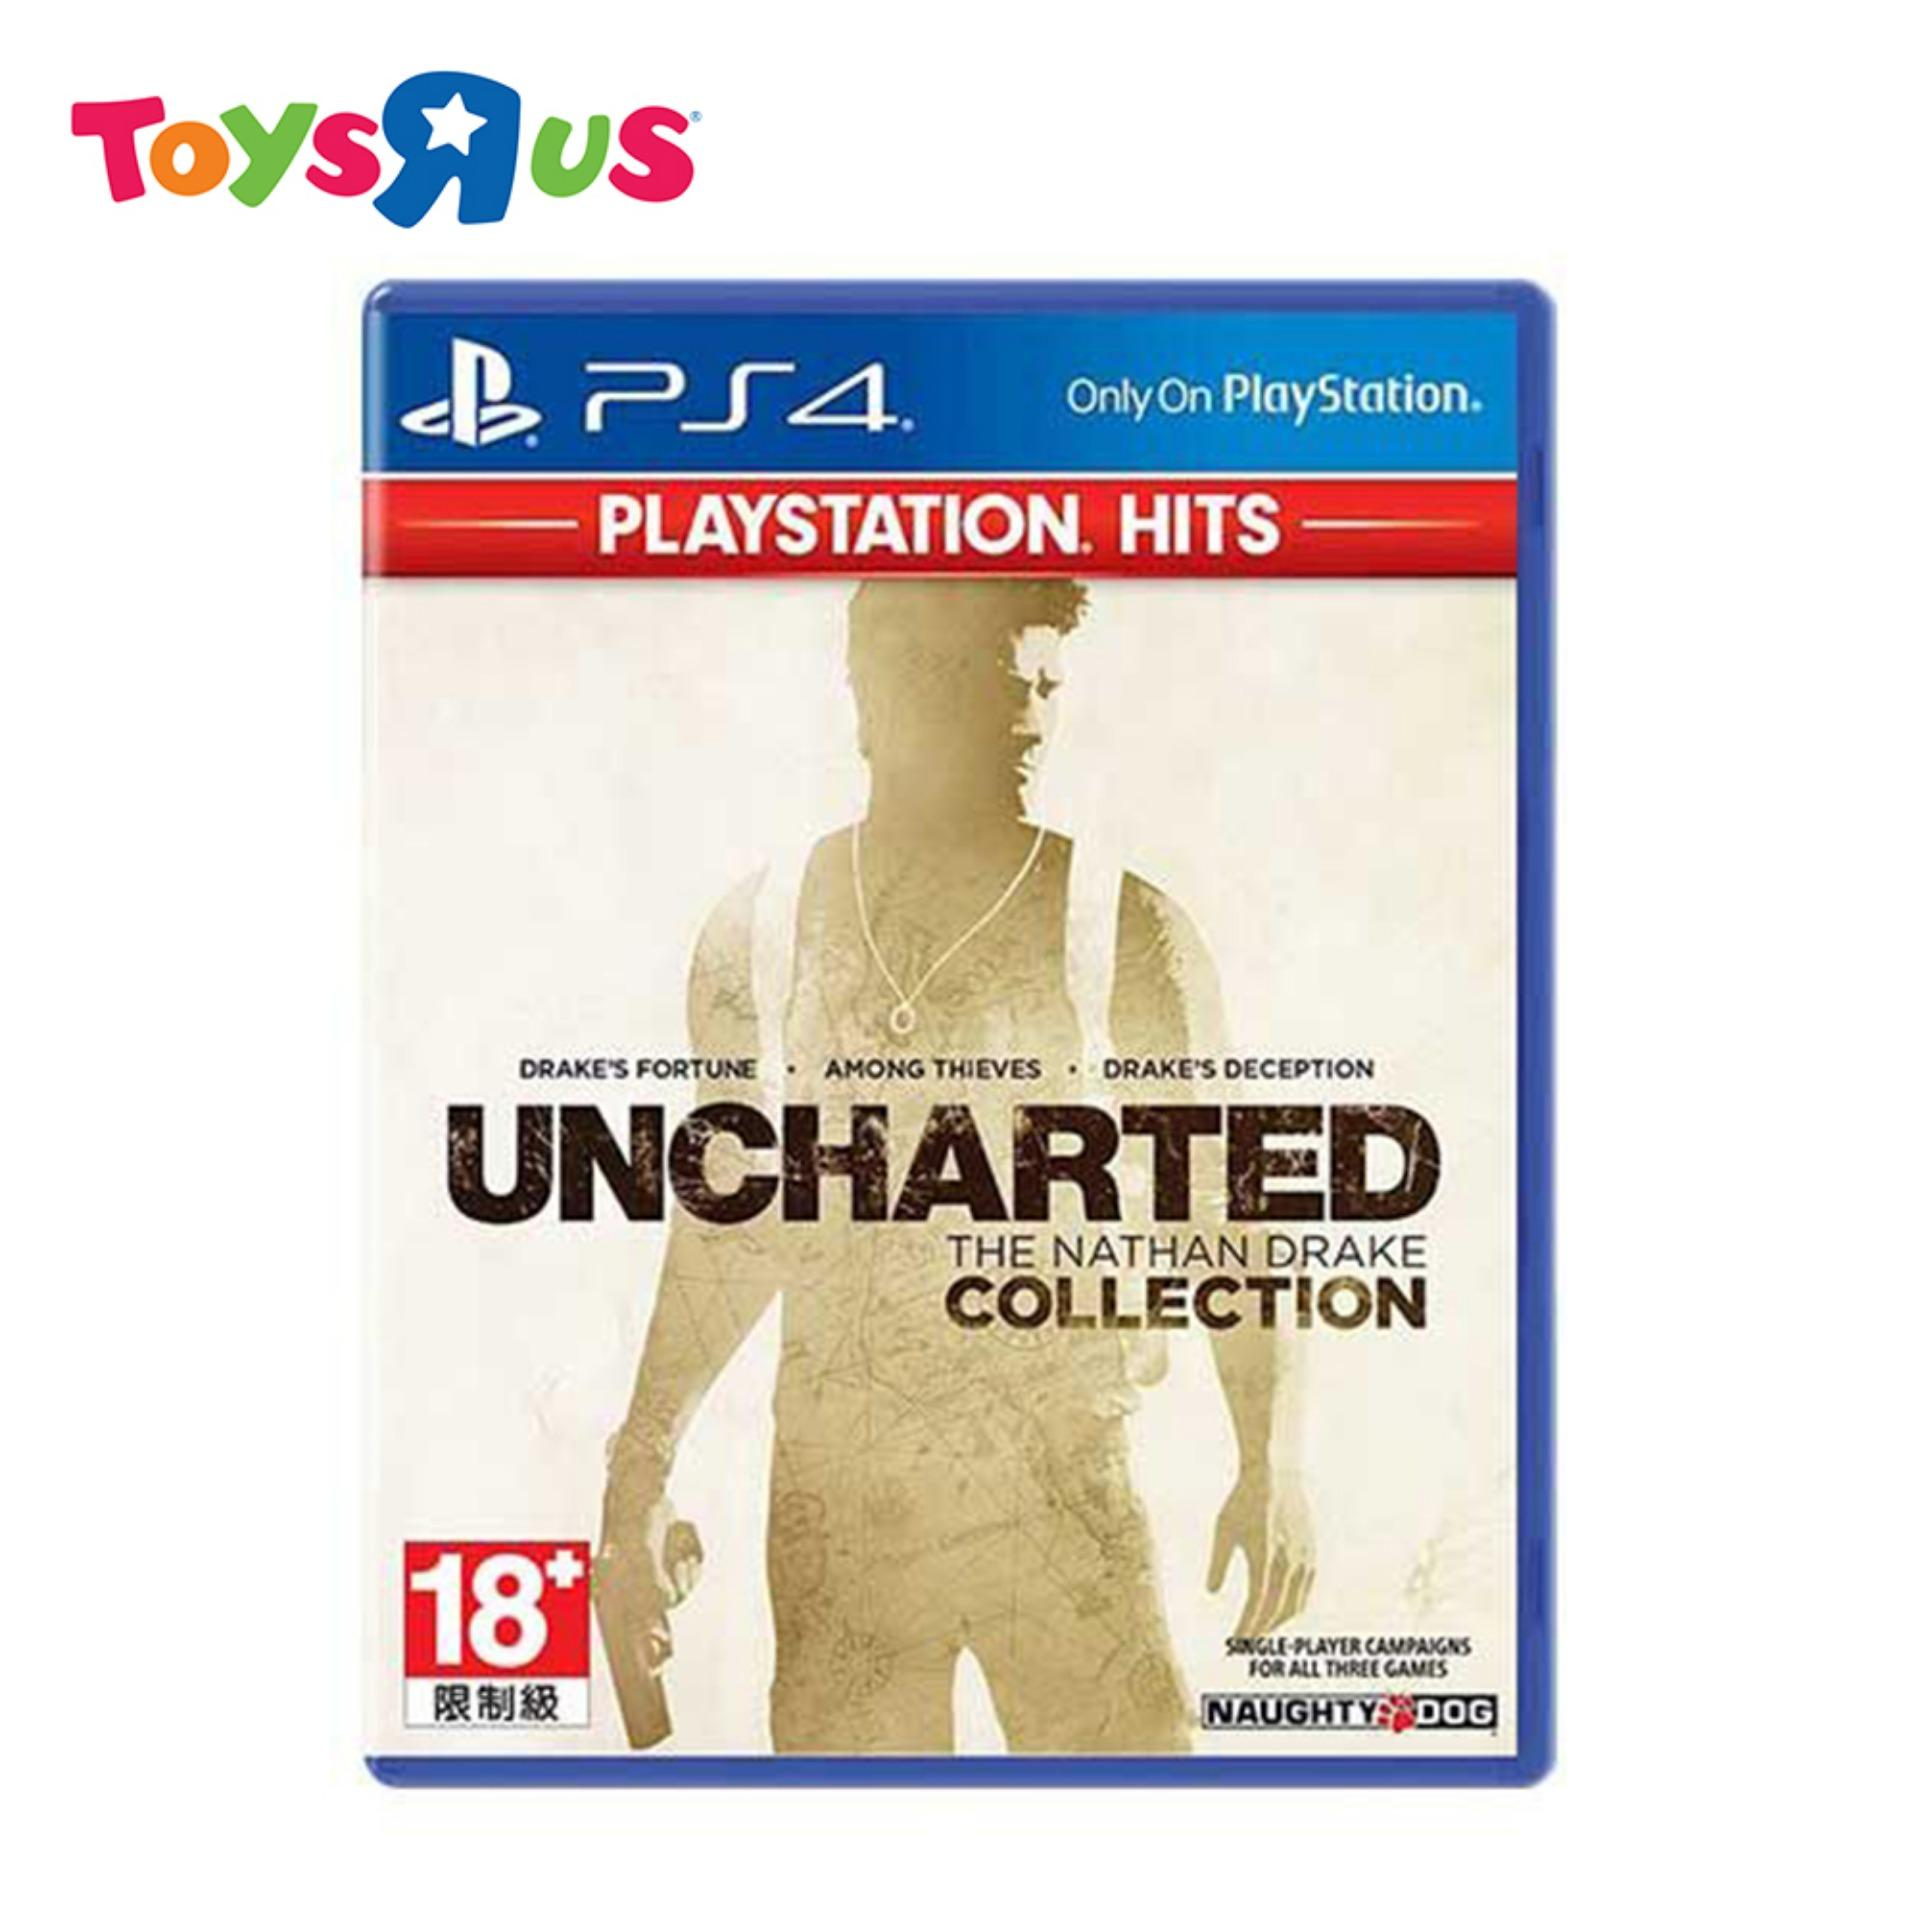 34266b175 PS4 Uncharted The Nathan Drake Collection - PlayStation Hits (R3)